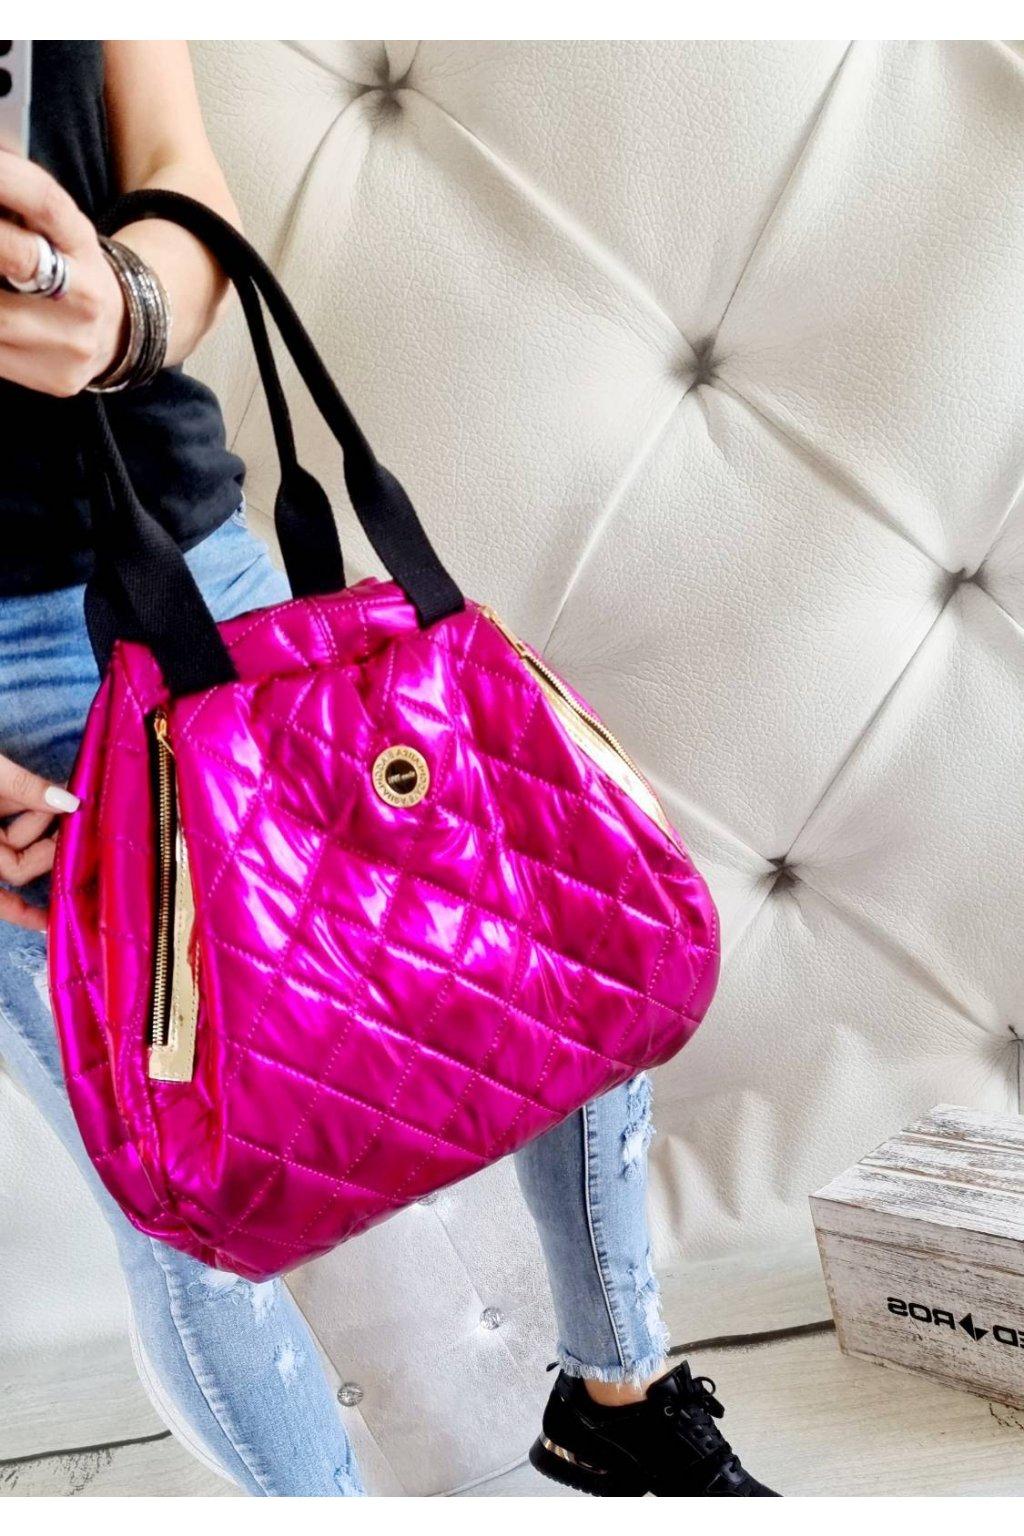 KABELKA laura biaggi extravagant trendy značková luxusní kabelka FUXIA